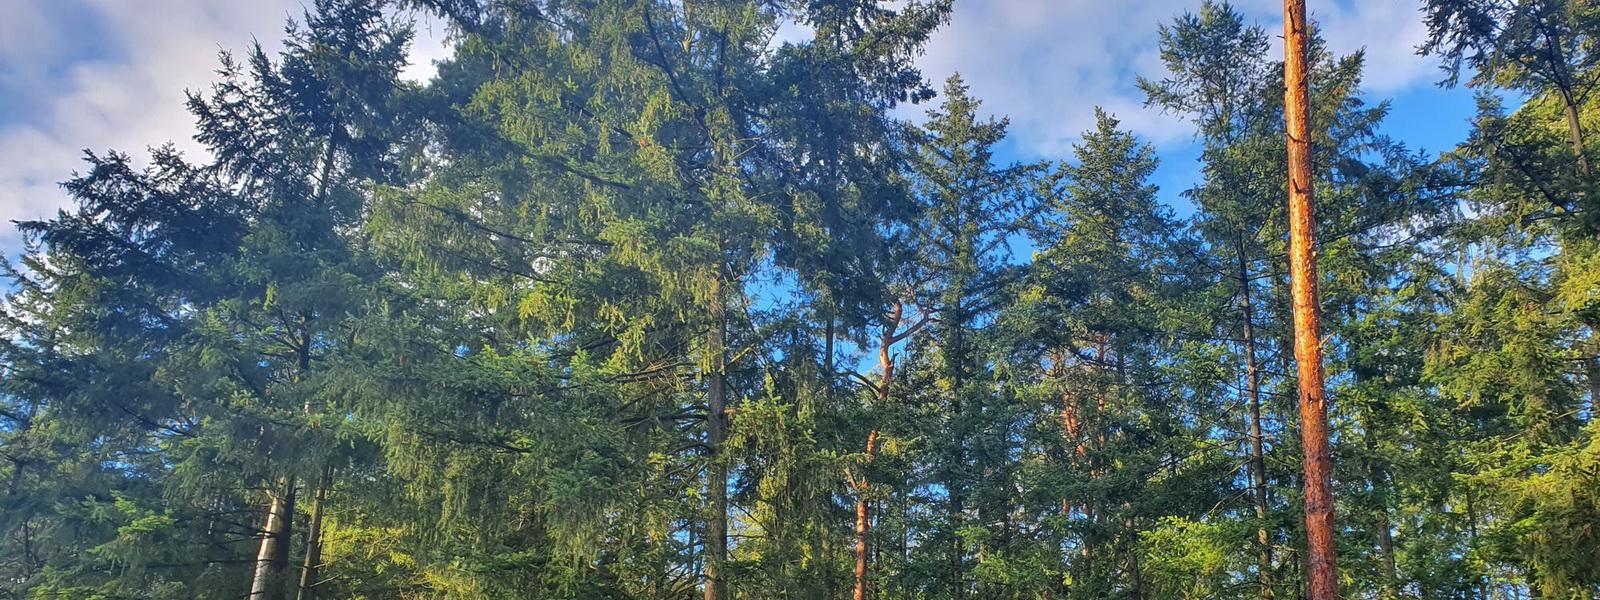 Der Tesla-Wald